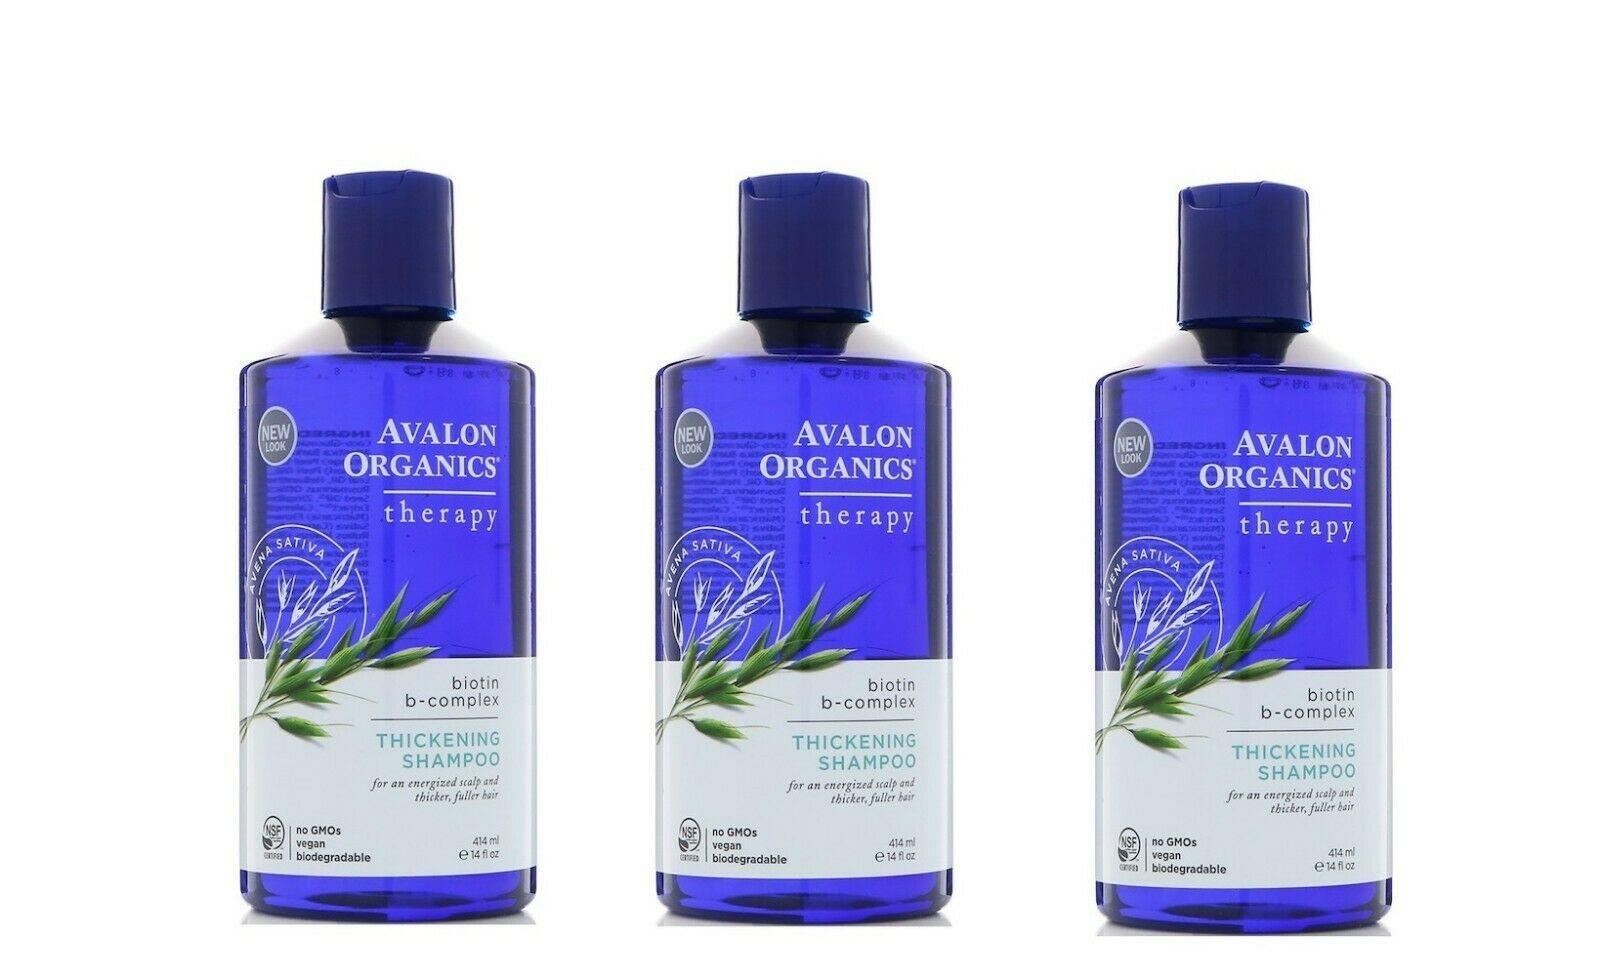 3pack Avalon Organics, Thickening Shampoo, Biotin B-Complex Therapy, 14 fl oz